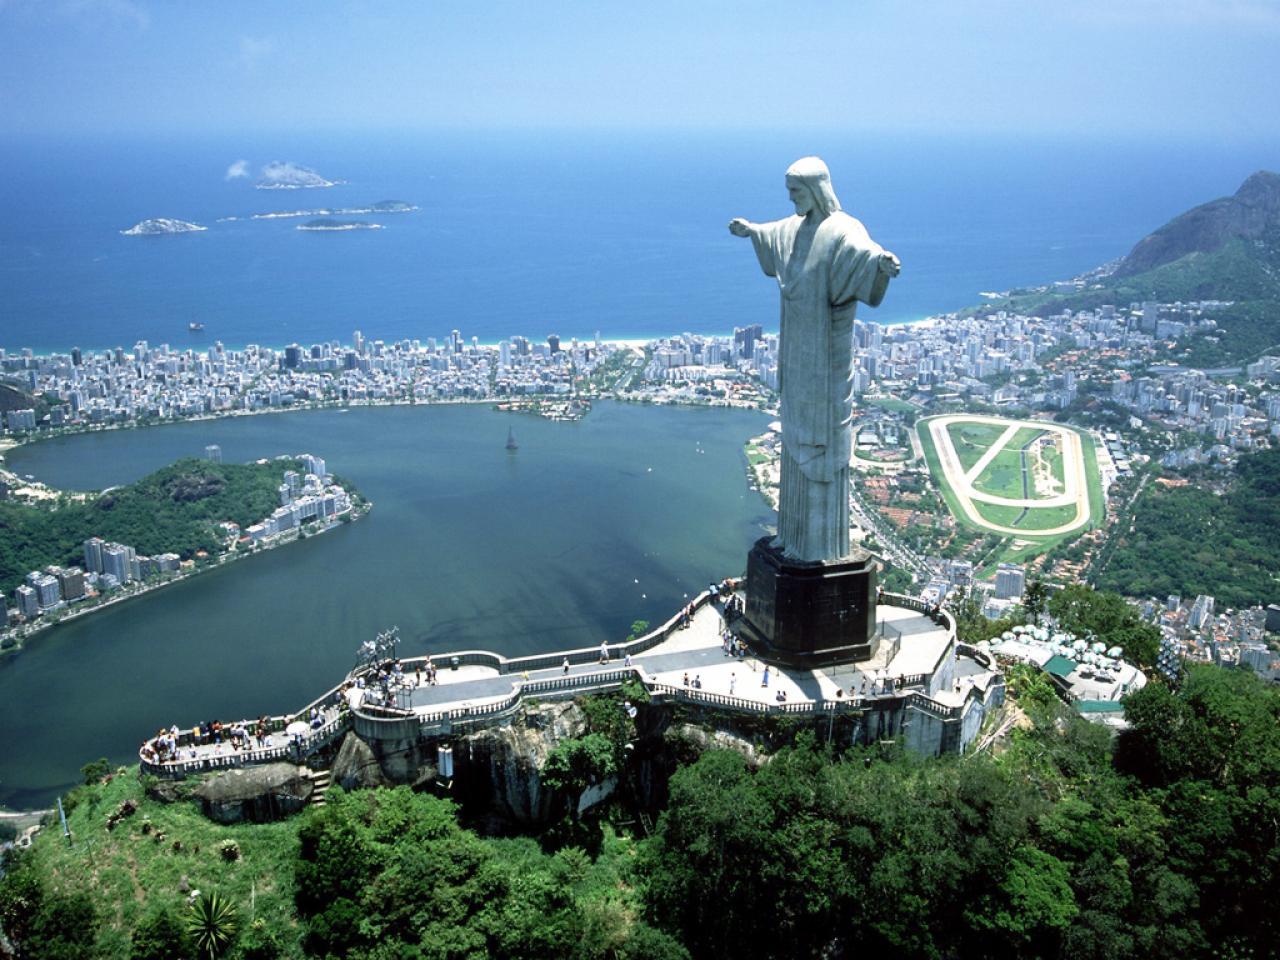 Modern 7 wonders of the world - Christ The Redeemer In Rio De Janeiro